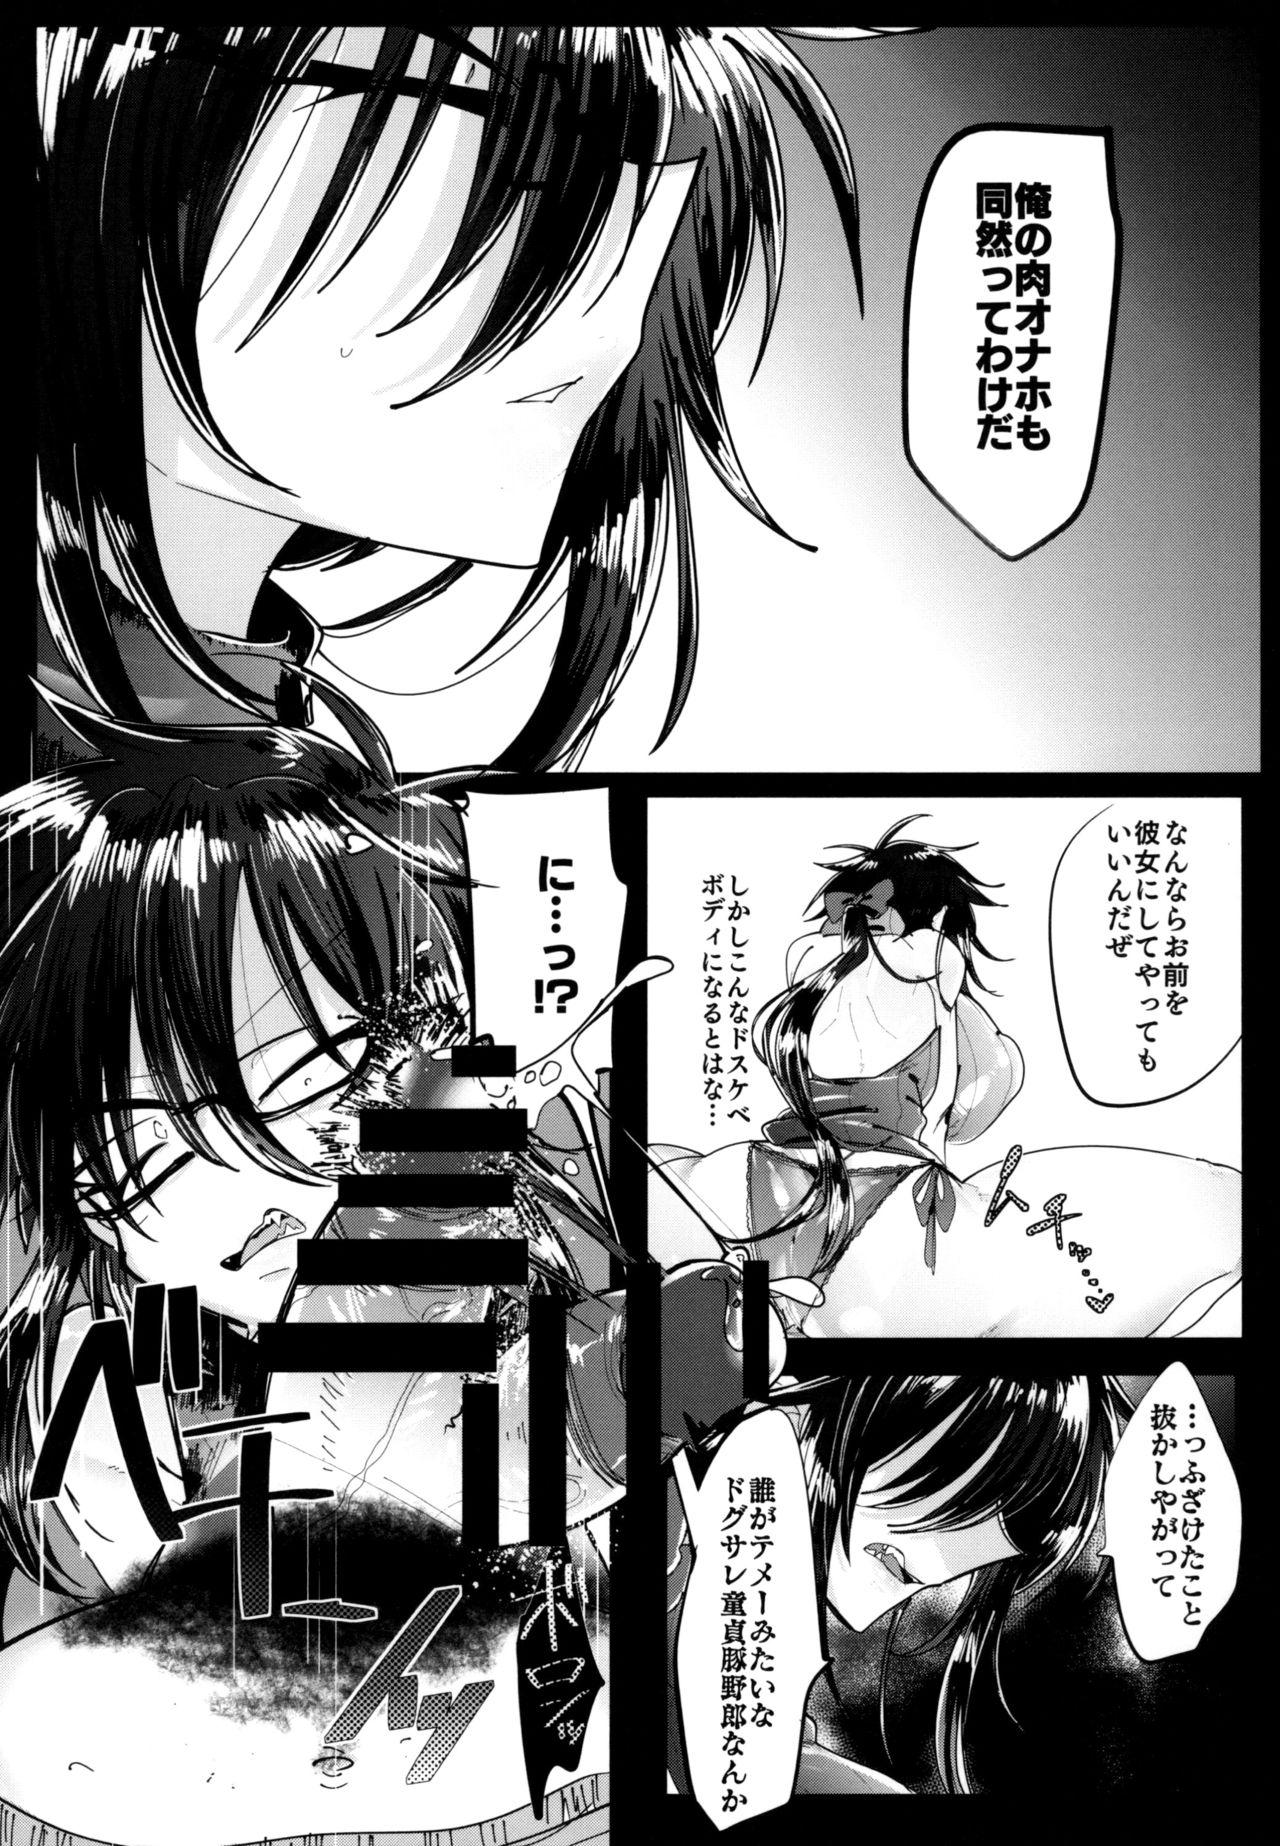 Kurokami Sanpakugan Megane Danshi TS Kyousei Fukujuu Fuck 6